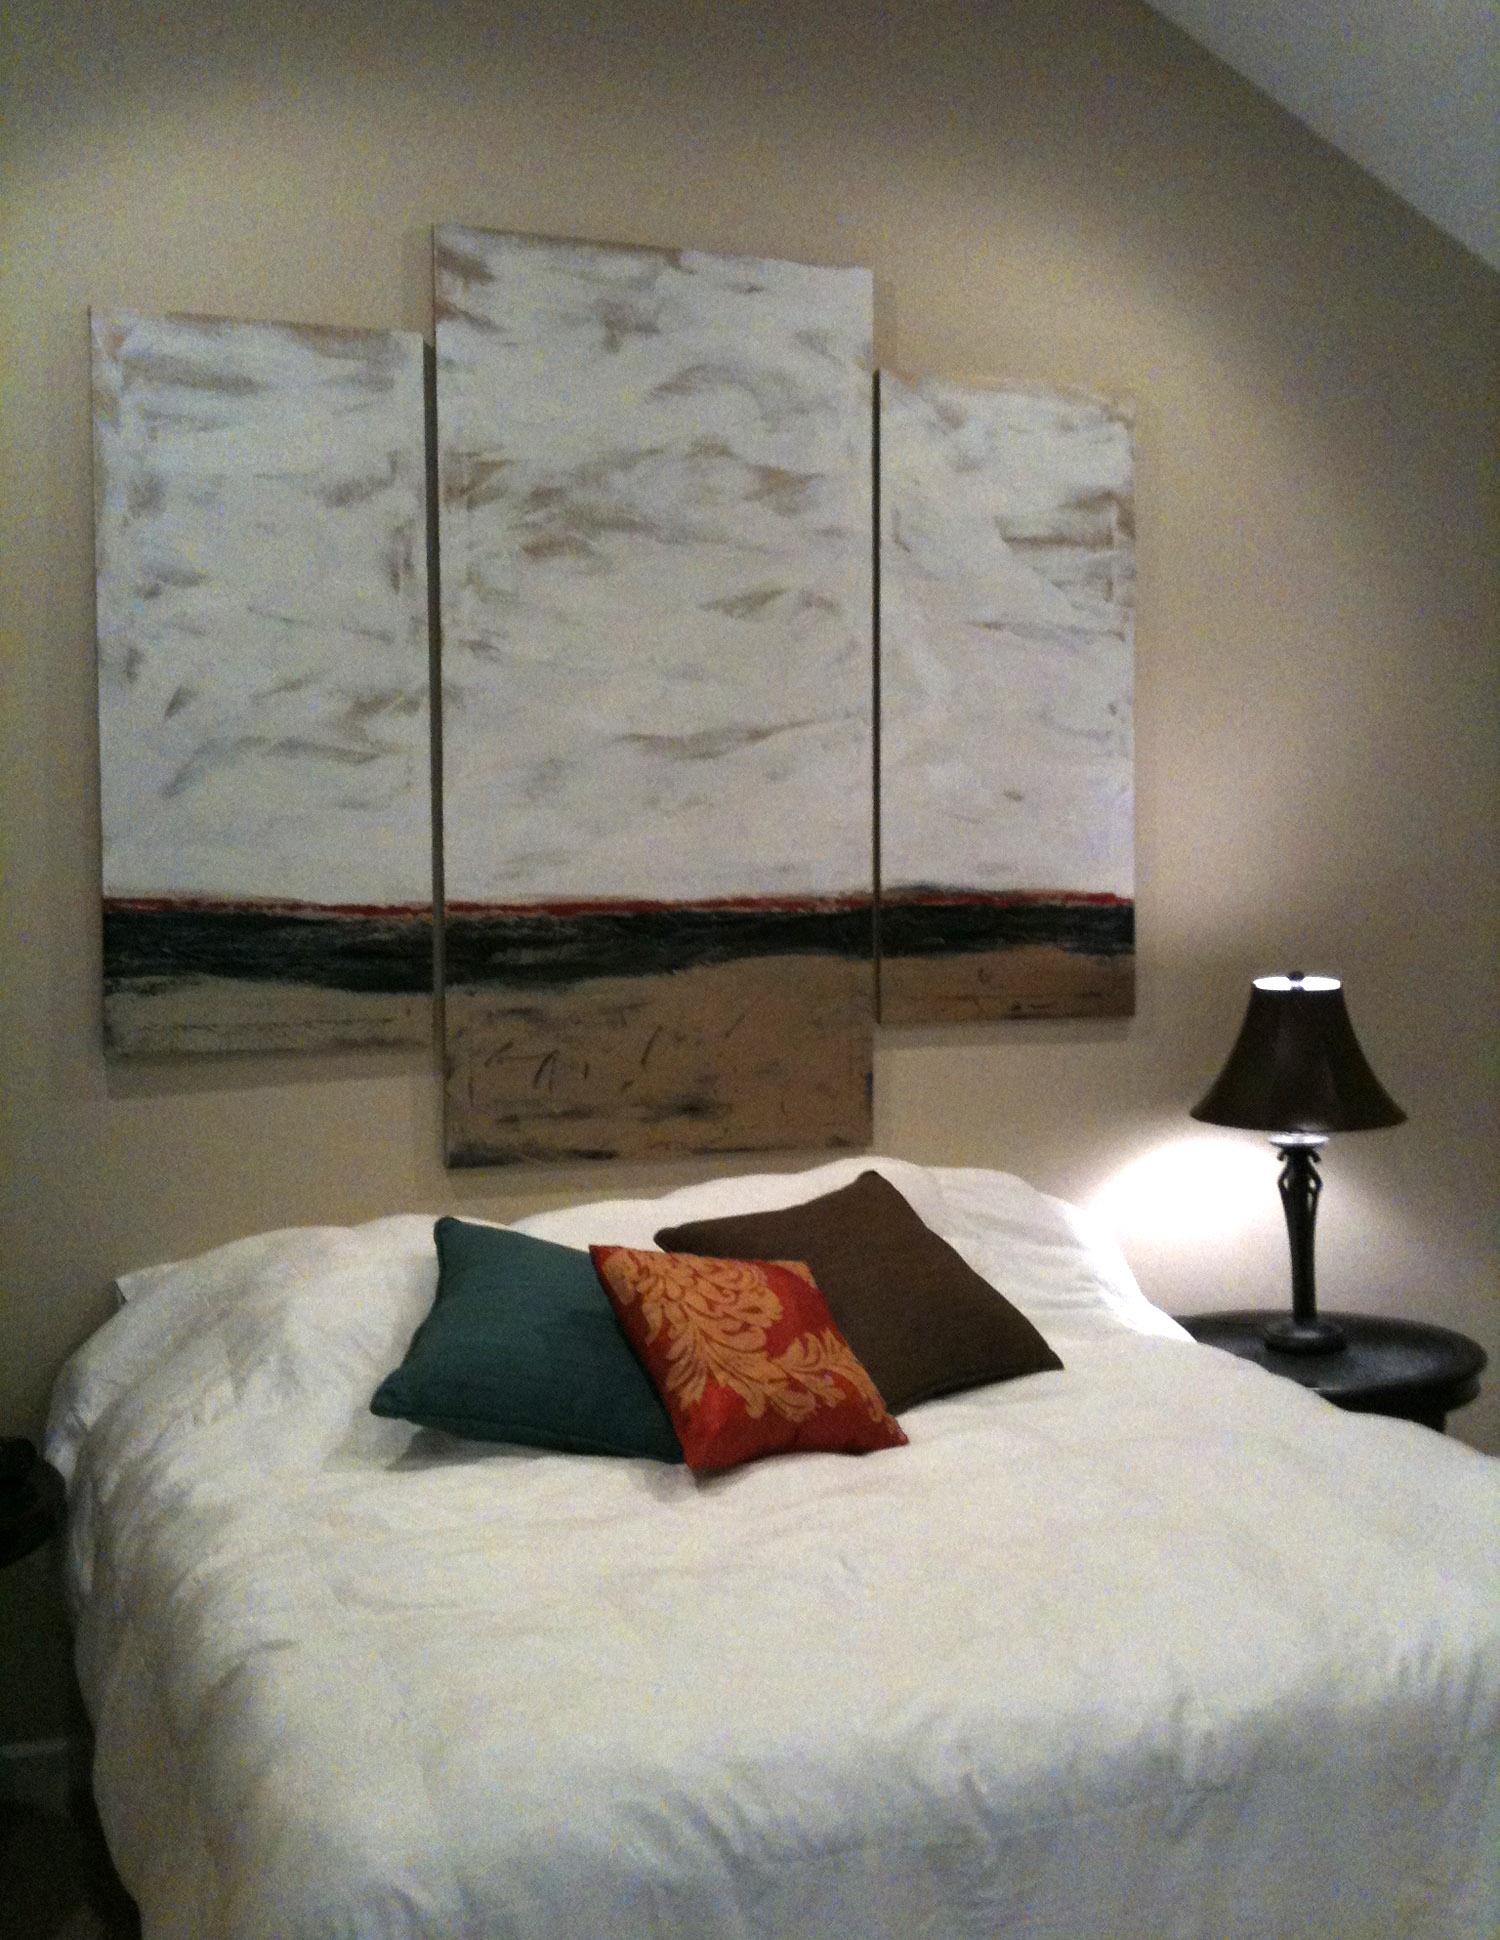 custom-art-commissions-by-greensboro-artist-tracey-marshall-img_0169.jpg